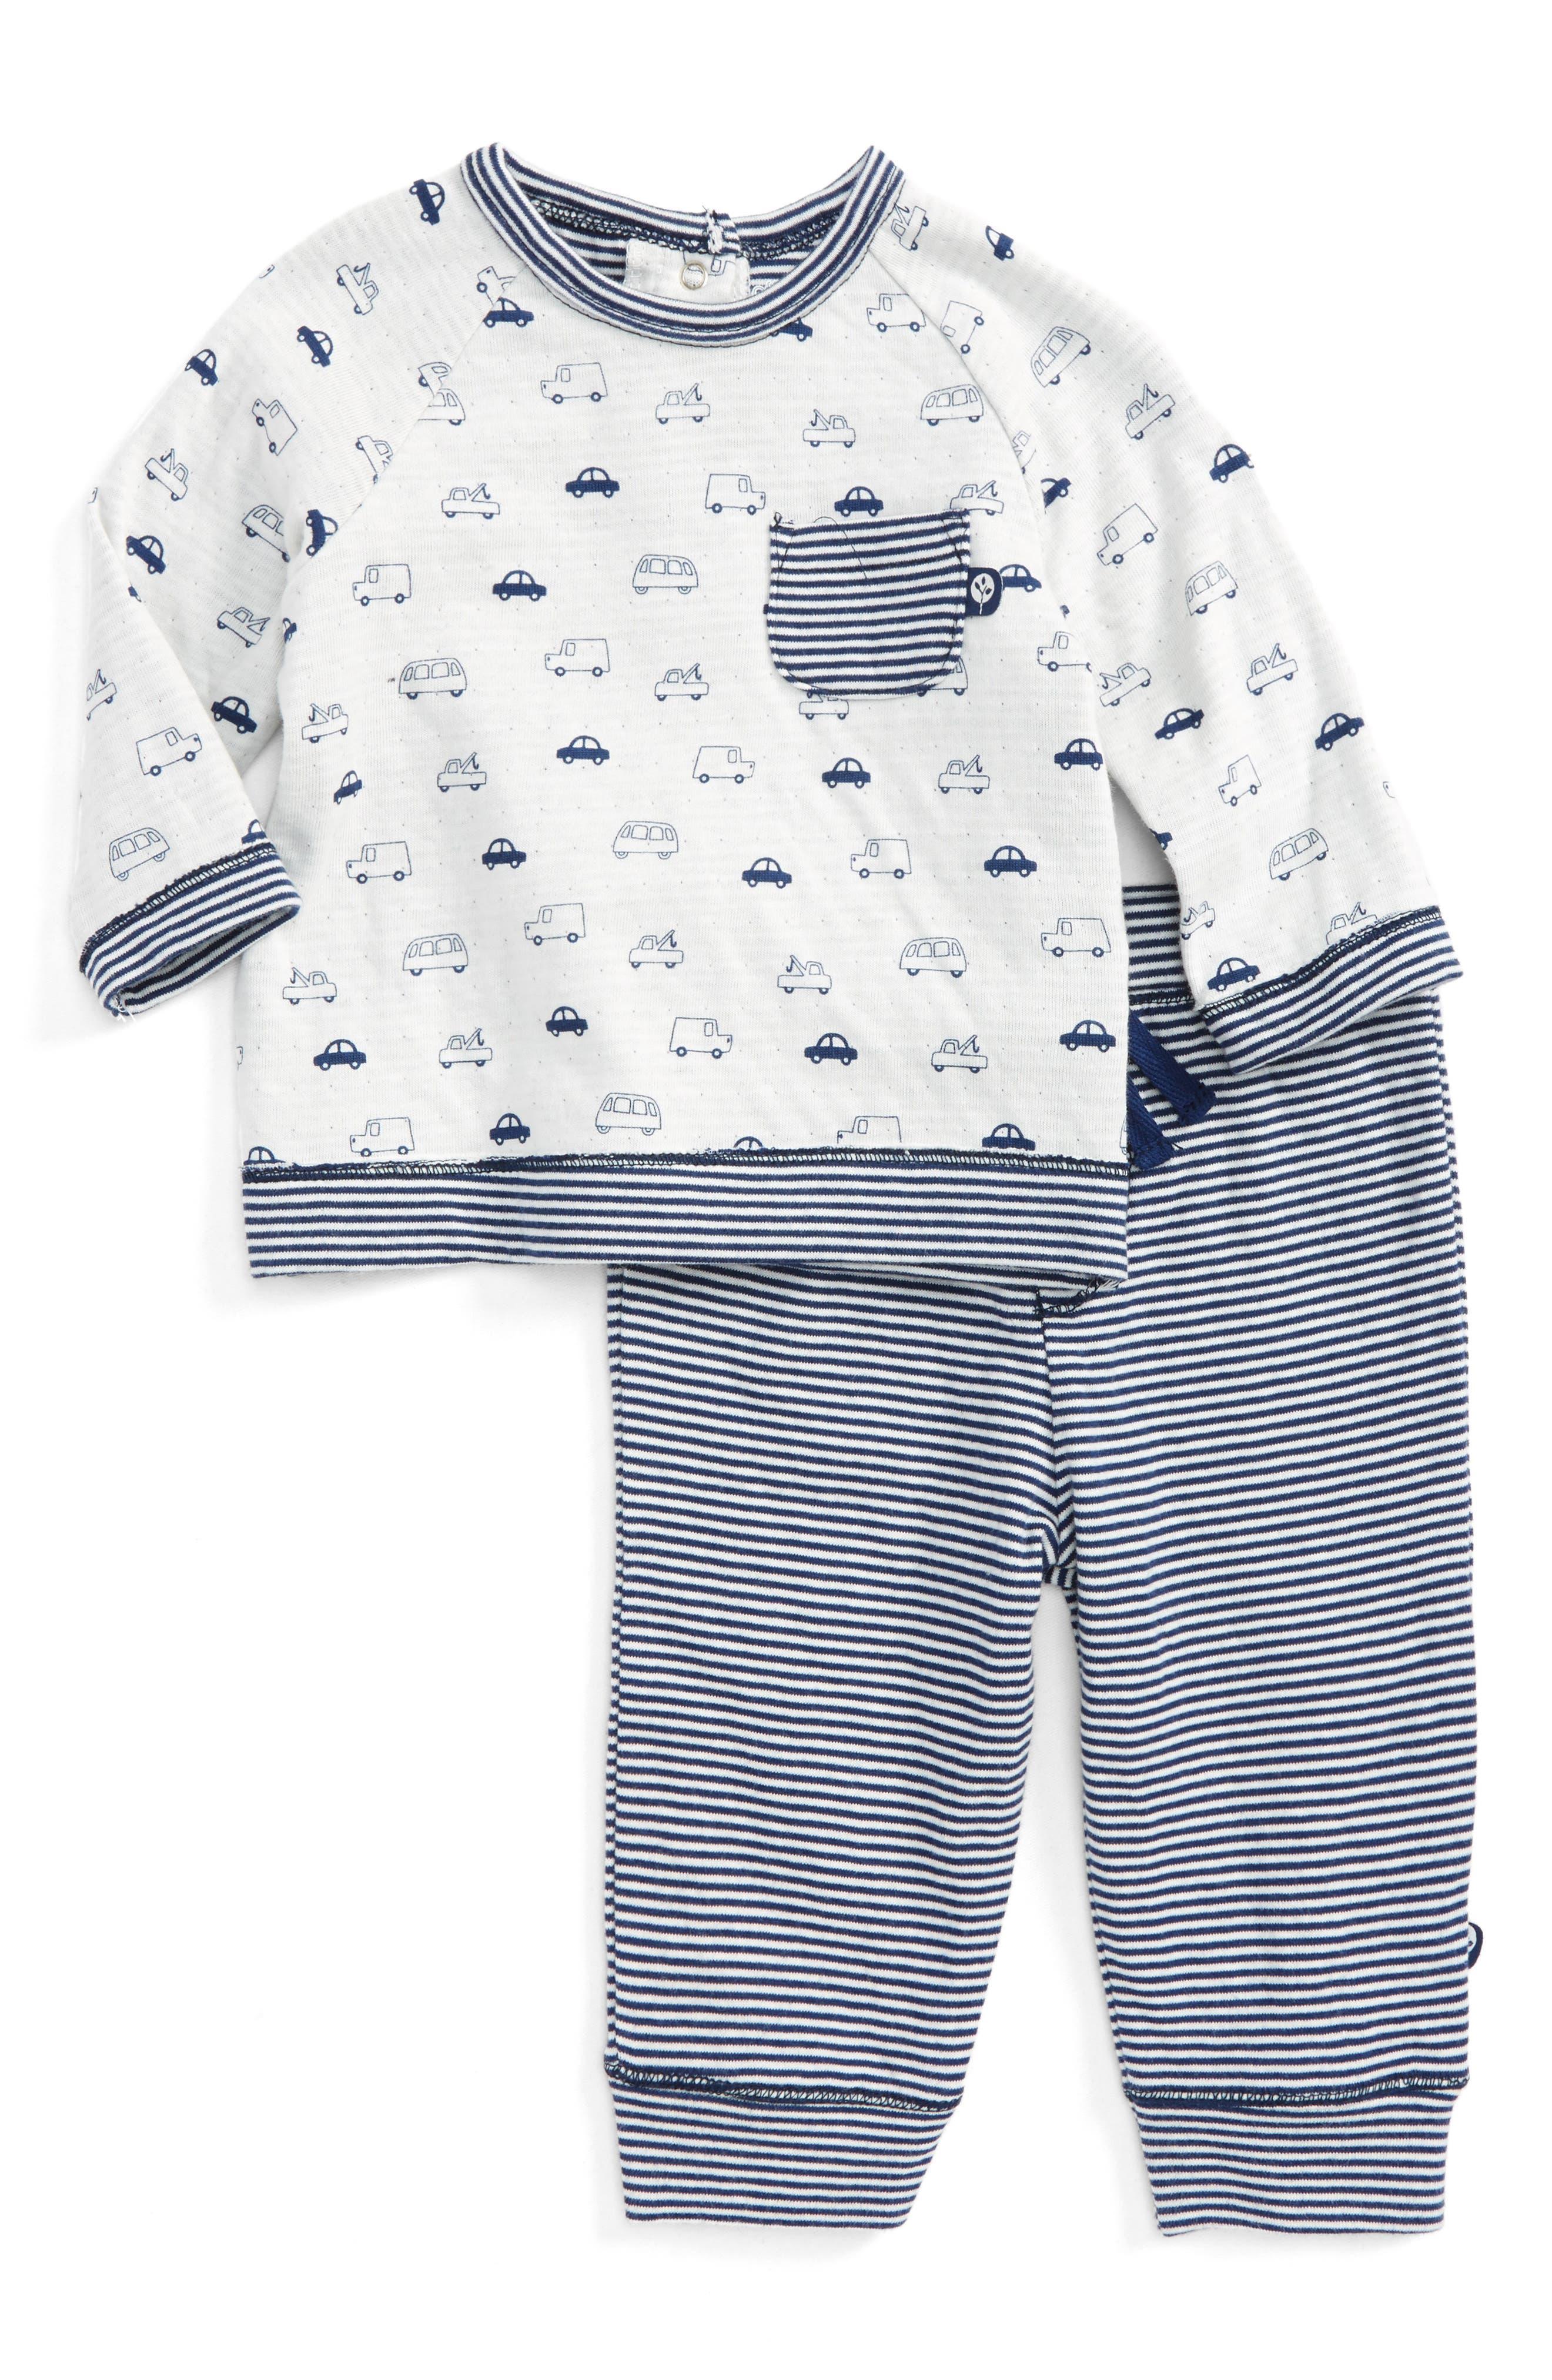 Traffic Circles Sweatshirt & Pants Set,                             Main thumbnail 1, color,                             Navy Stripe